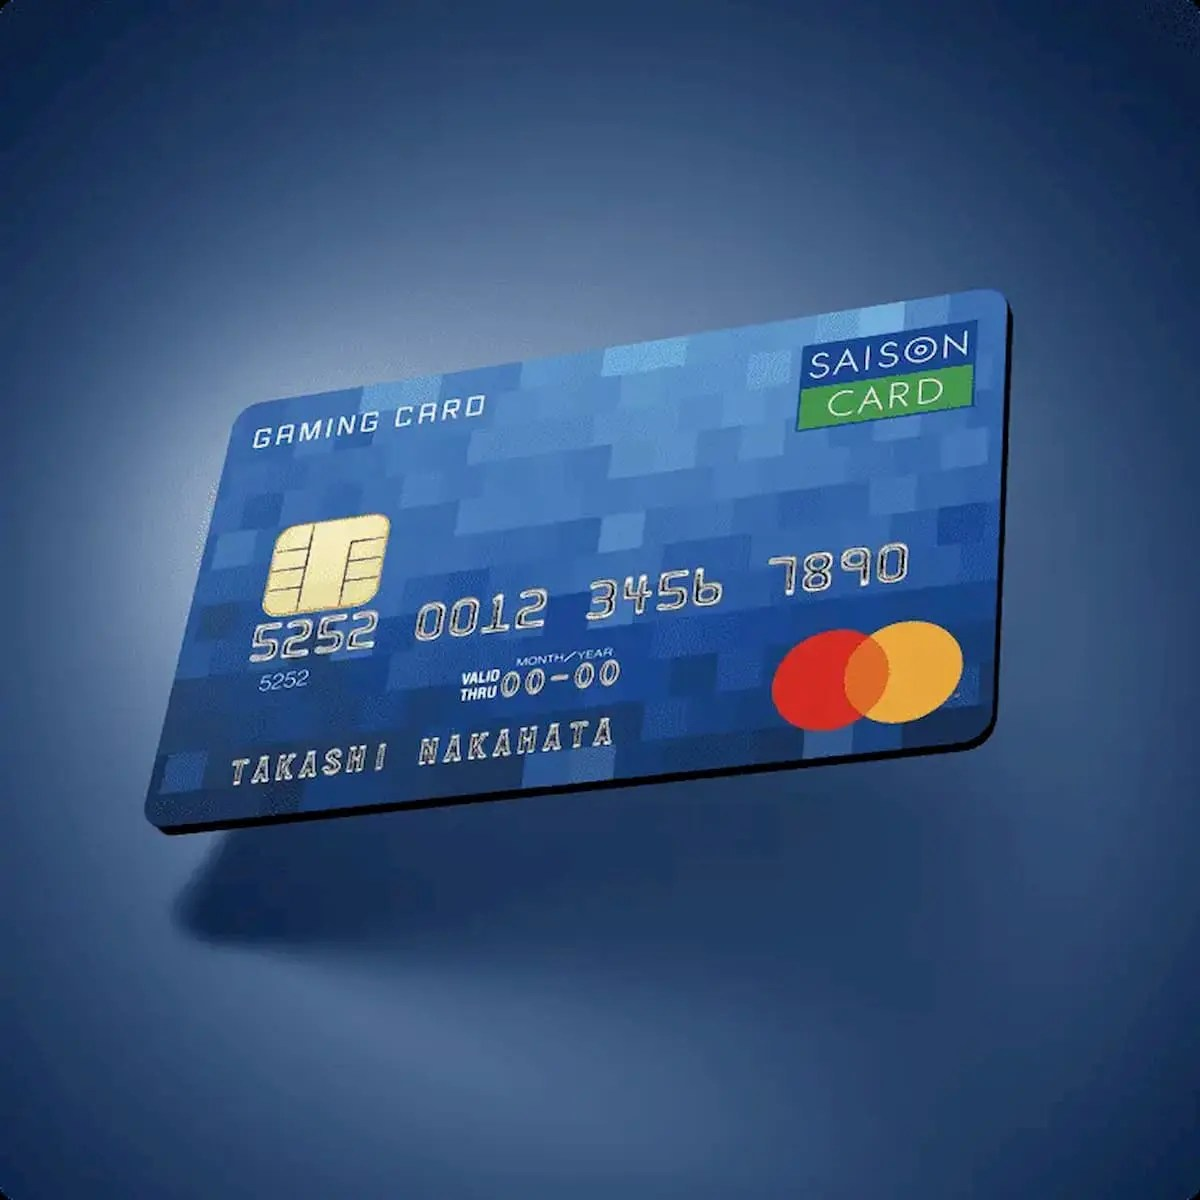 「GAMING CARD」イメージ